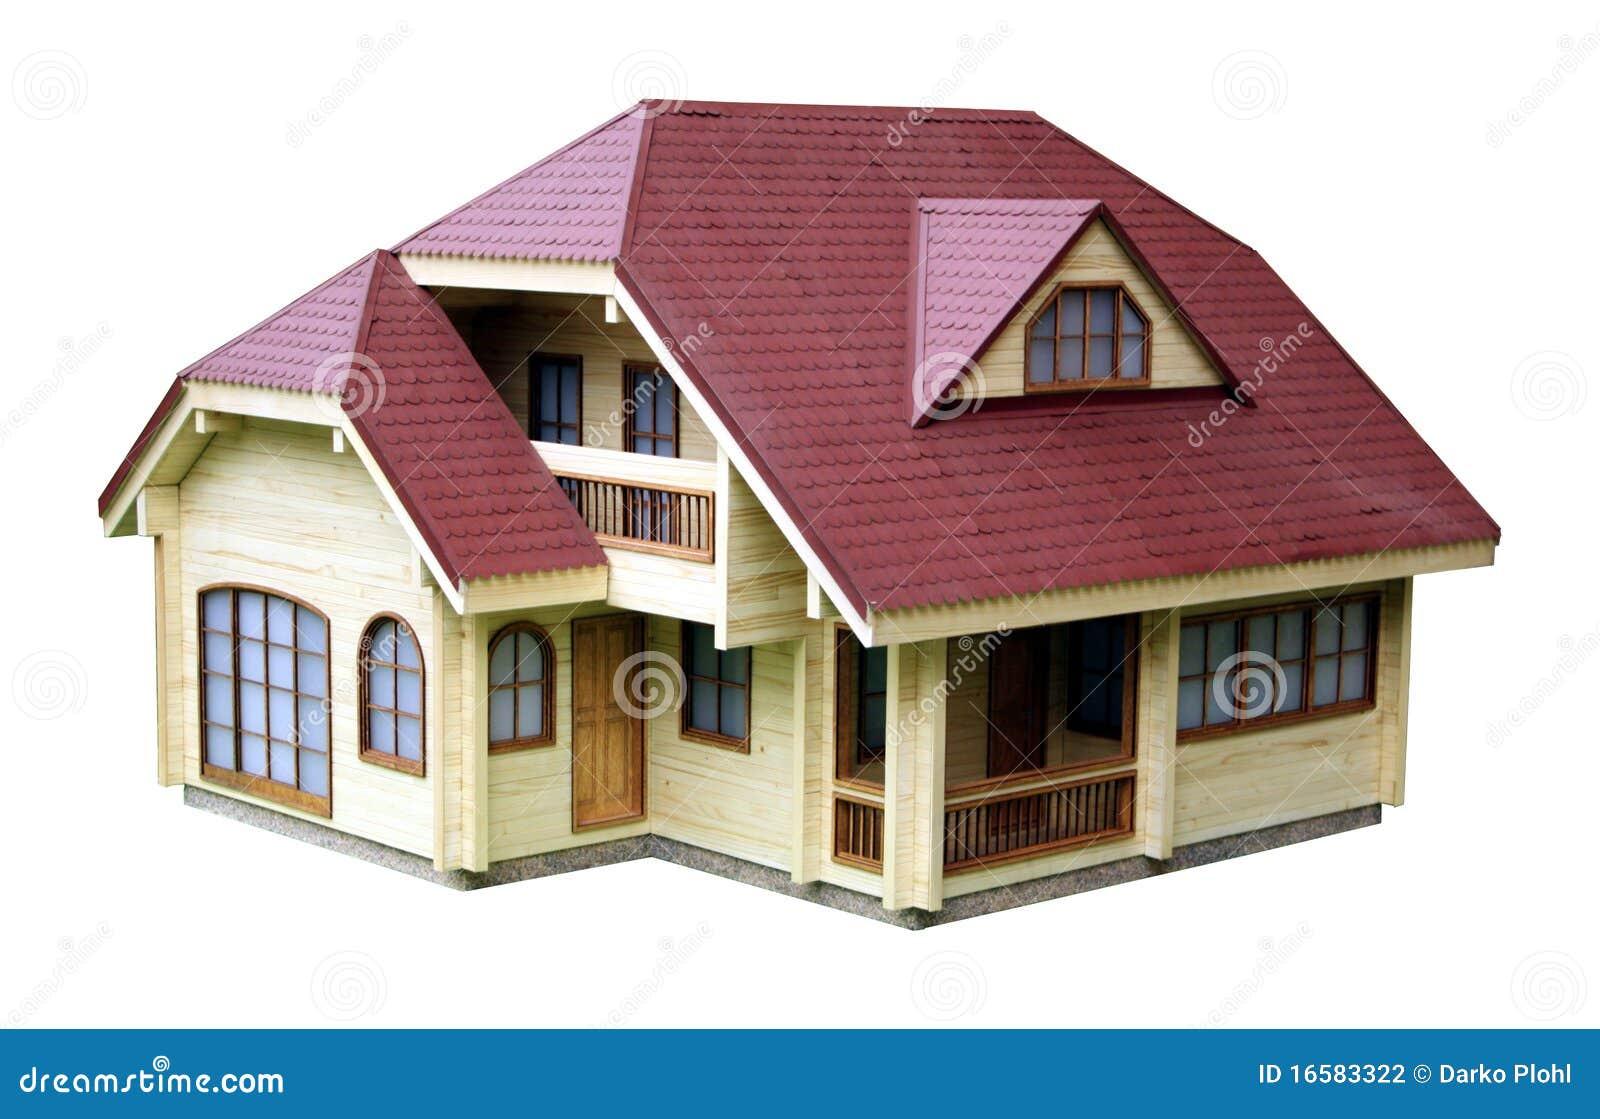 Huis exterieur model huis te koop in markegem huis d dewaele